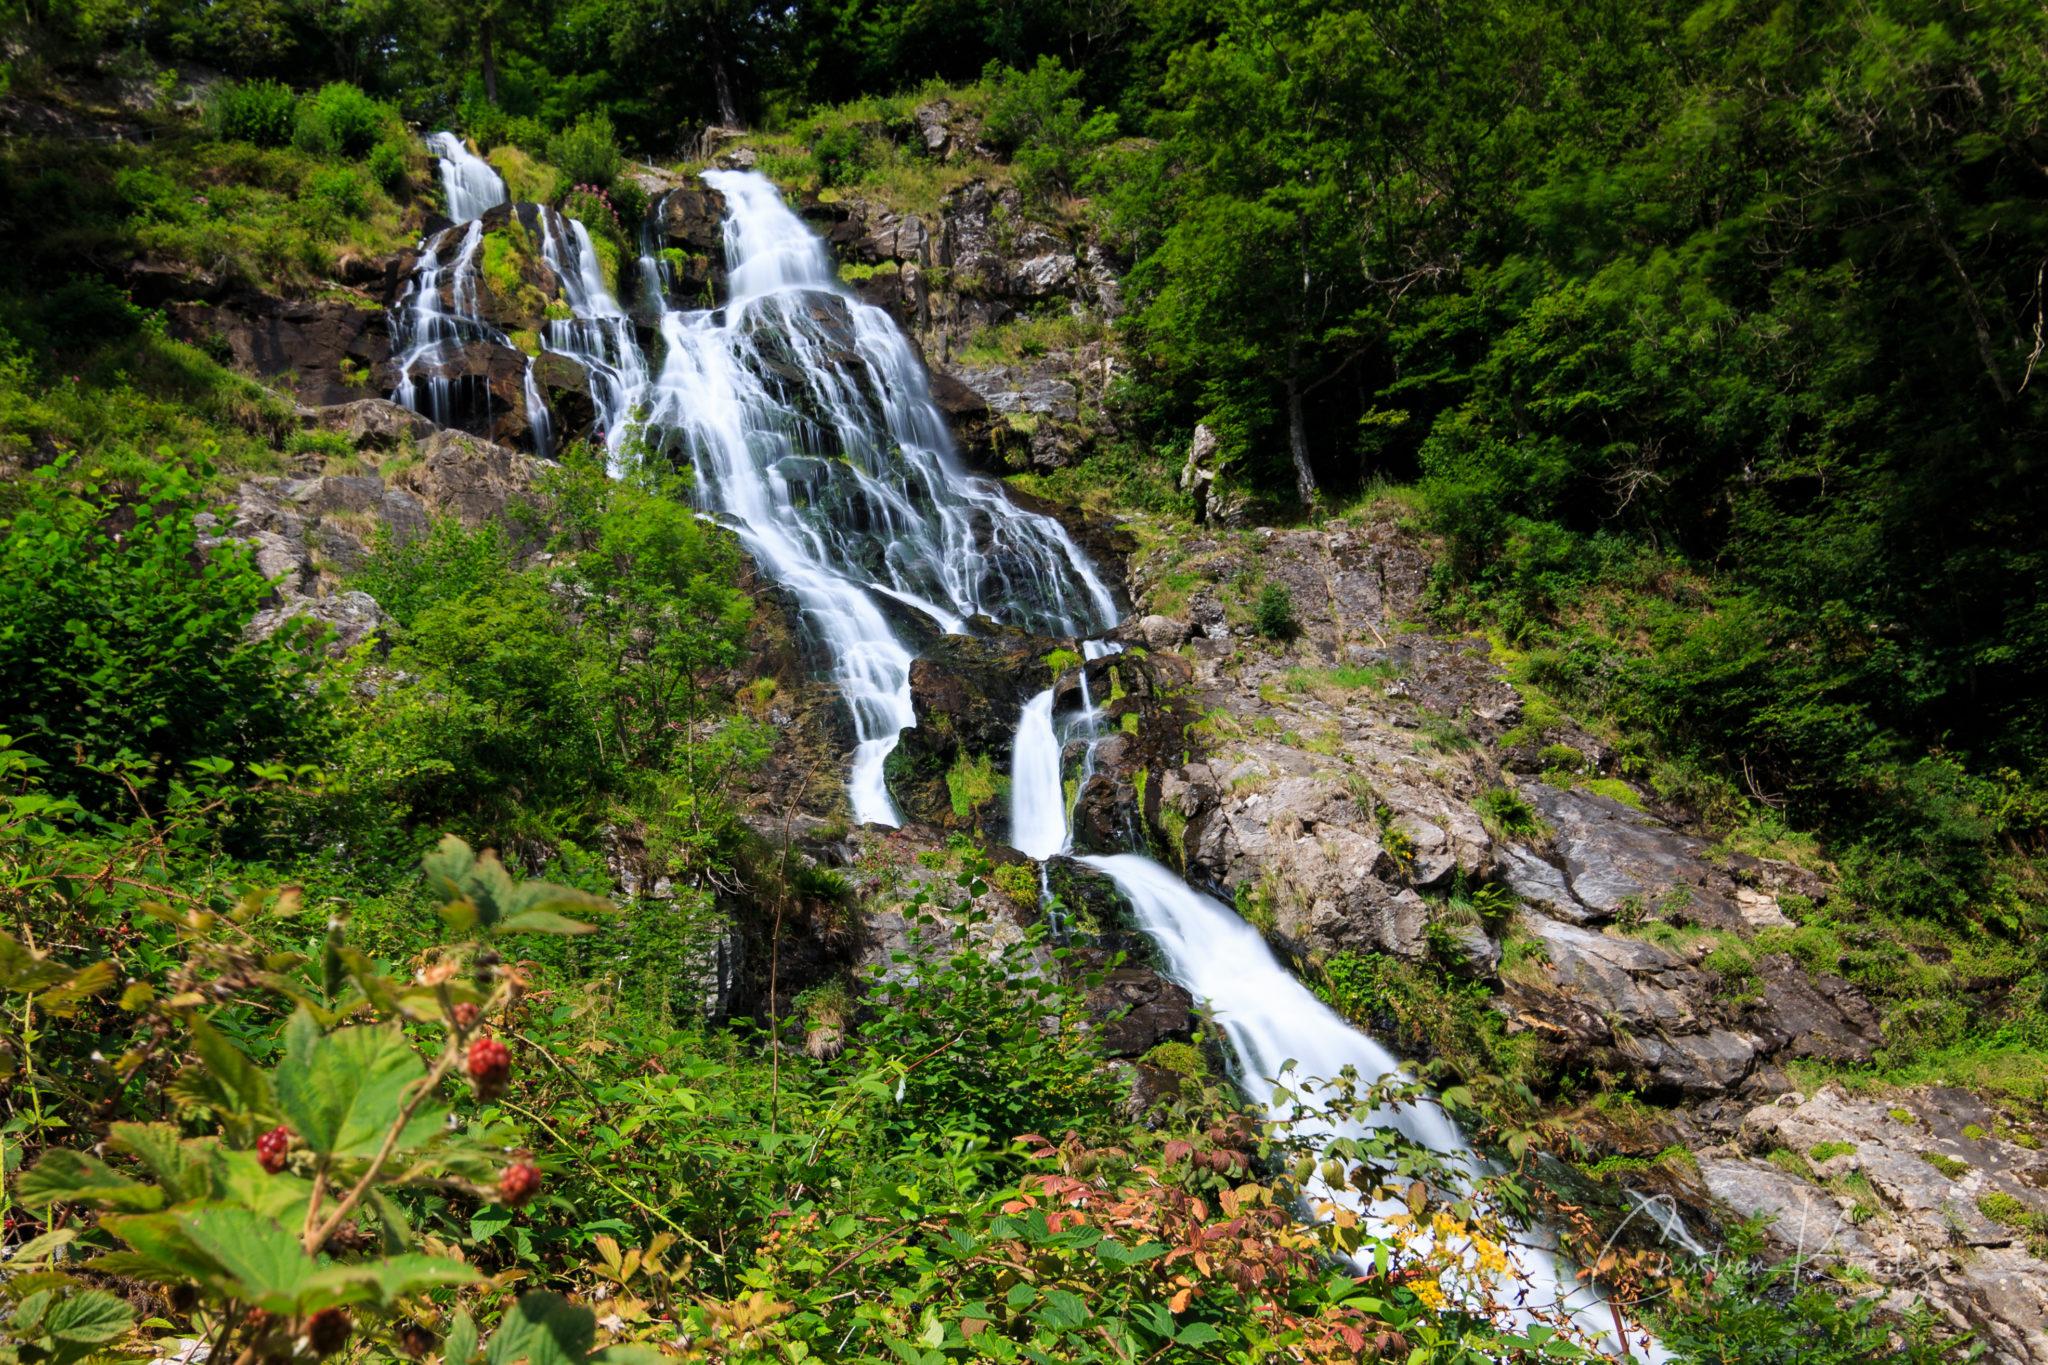 Todnauer Wasserfall II